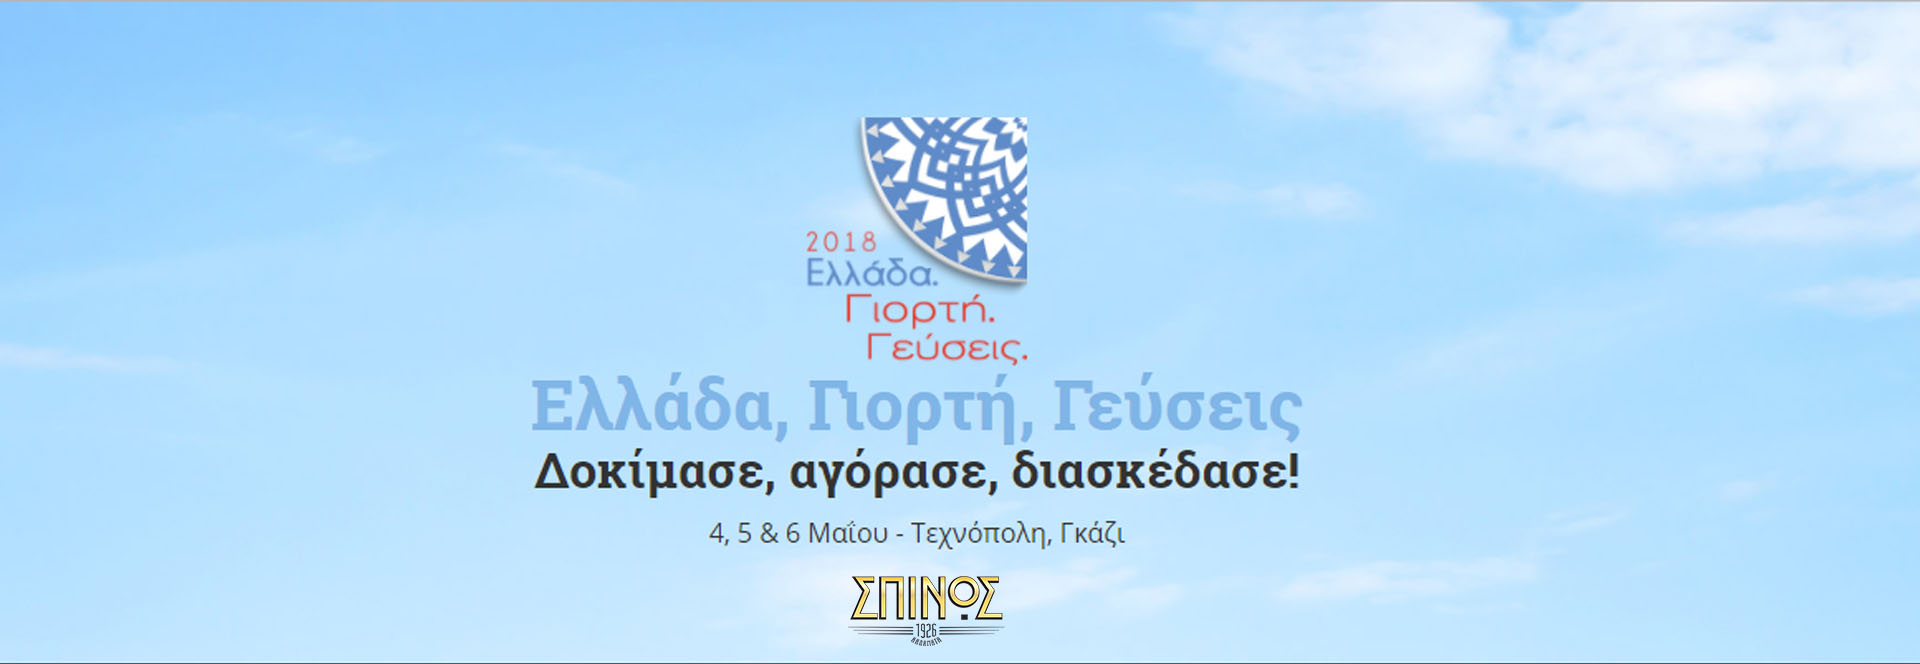 Spinos Coffee Ελλάδα - Γιορτή - Γεύσεις